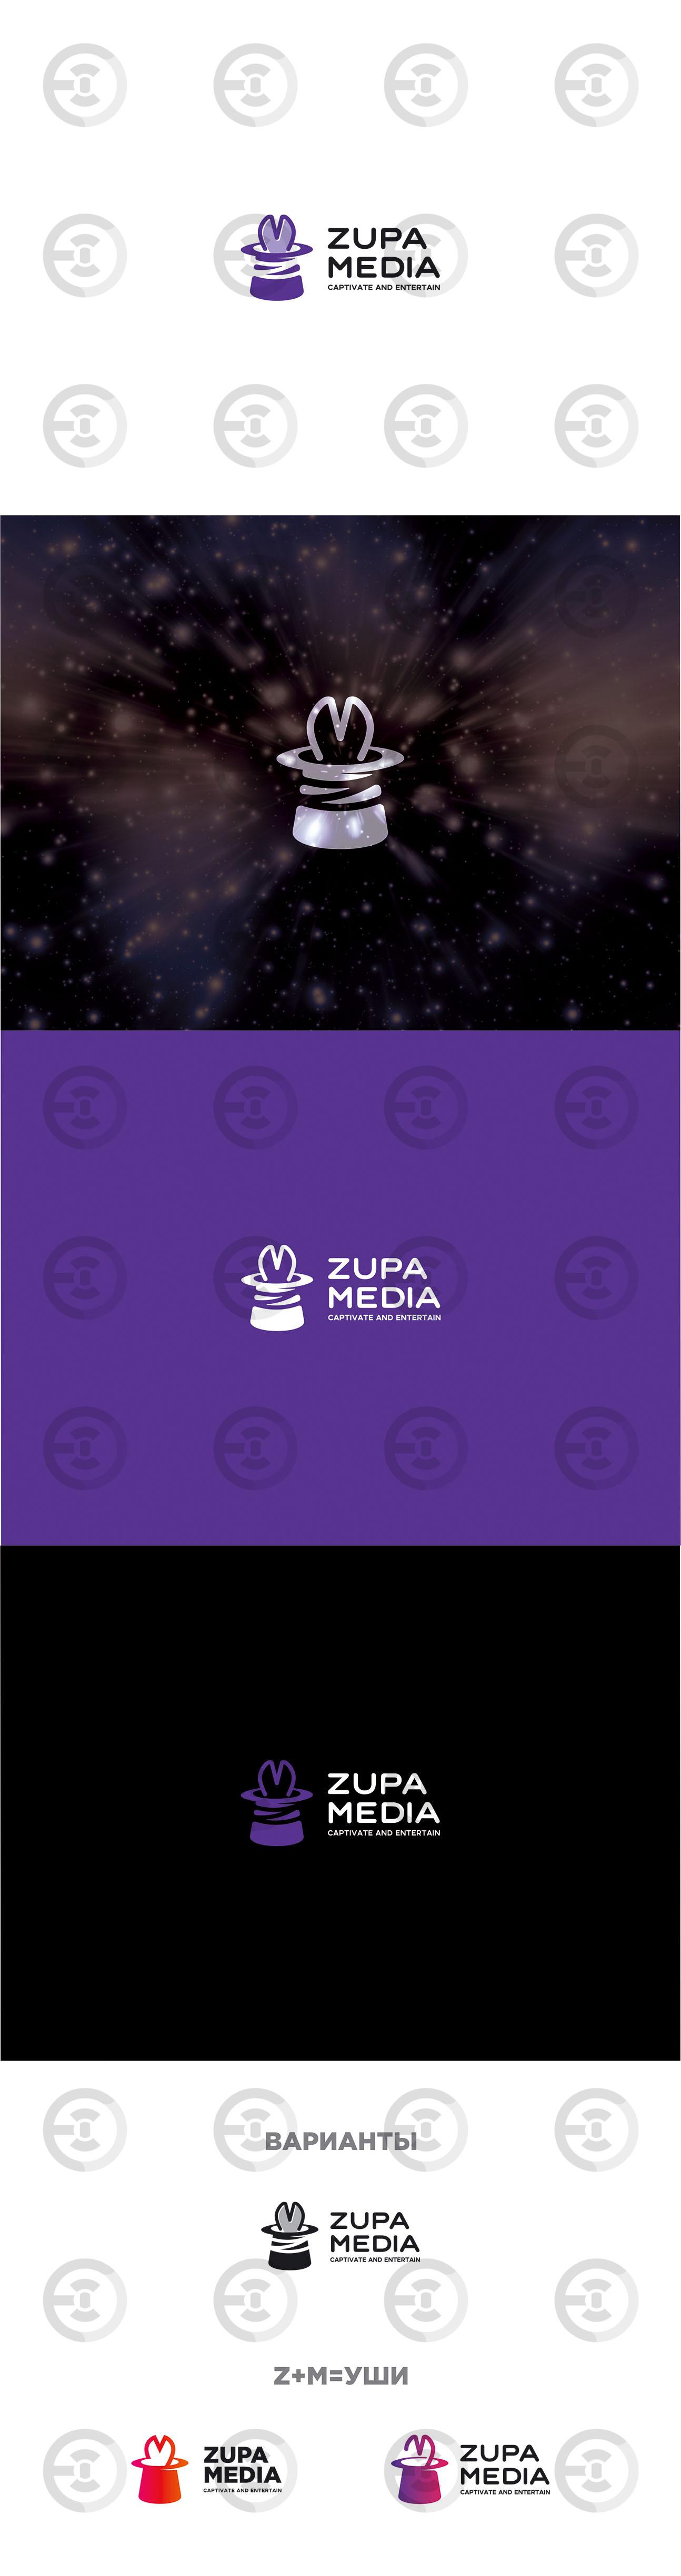 ZUPA MEDIA9.jpg